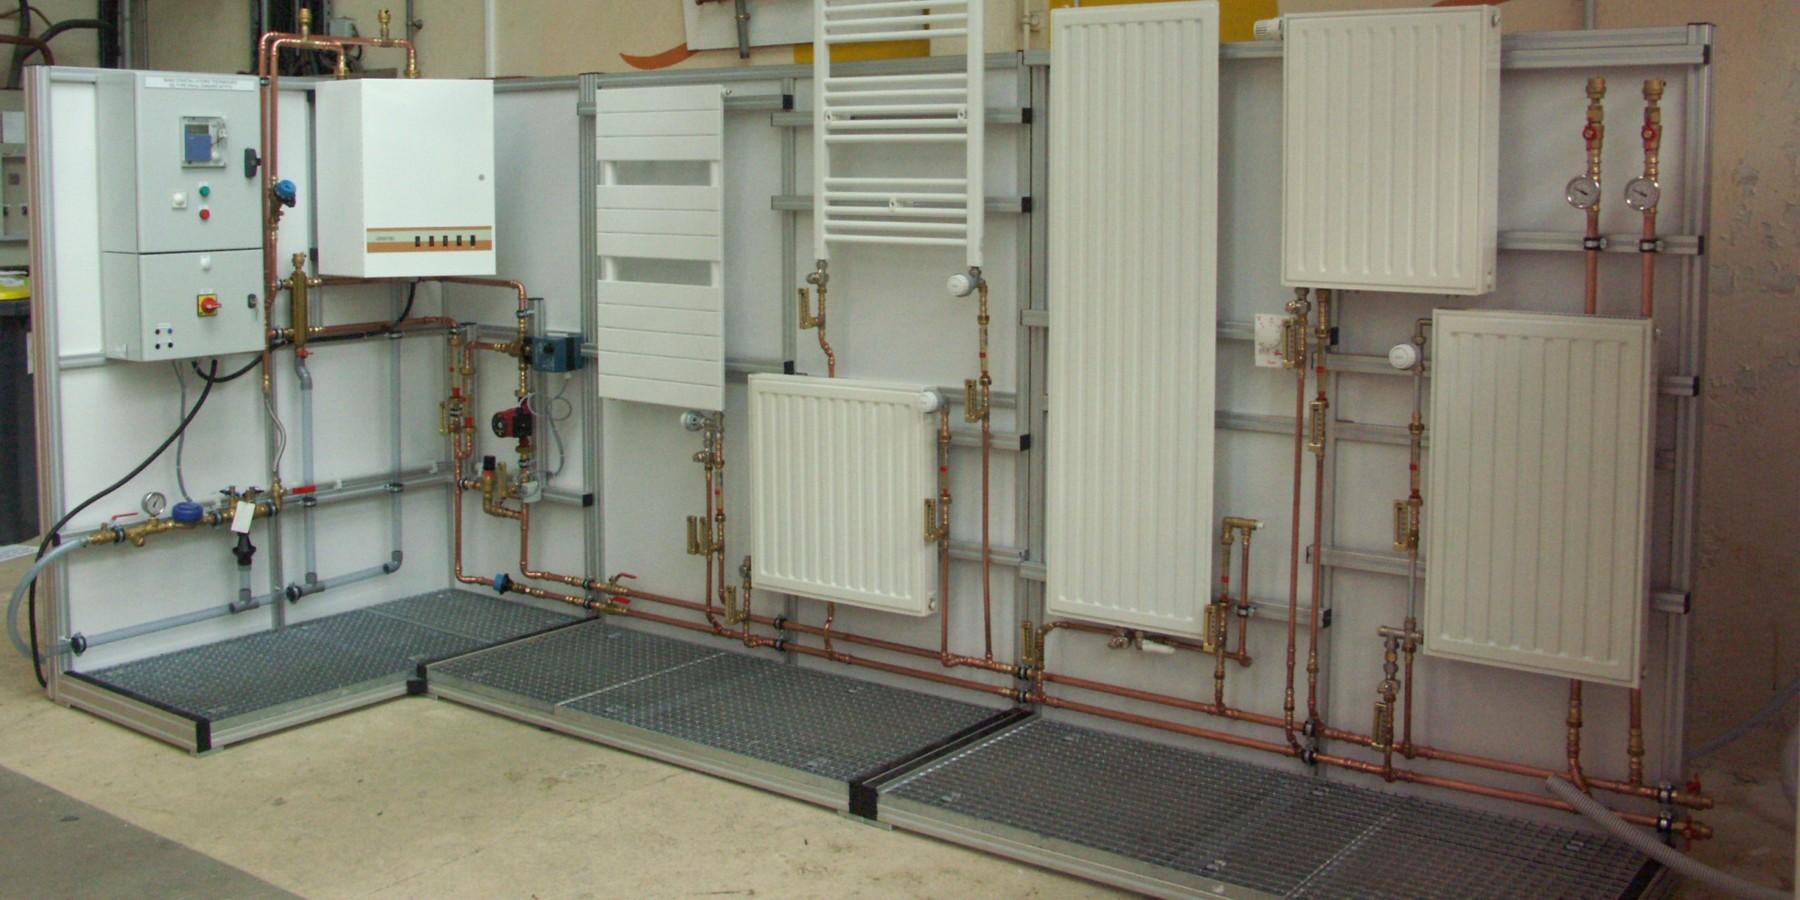 Installation thermique pavillonnaire